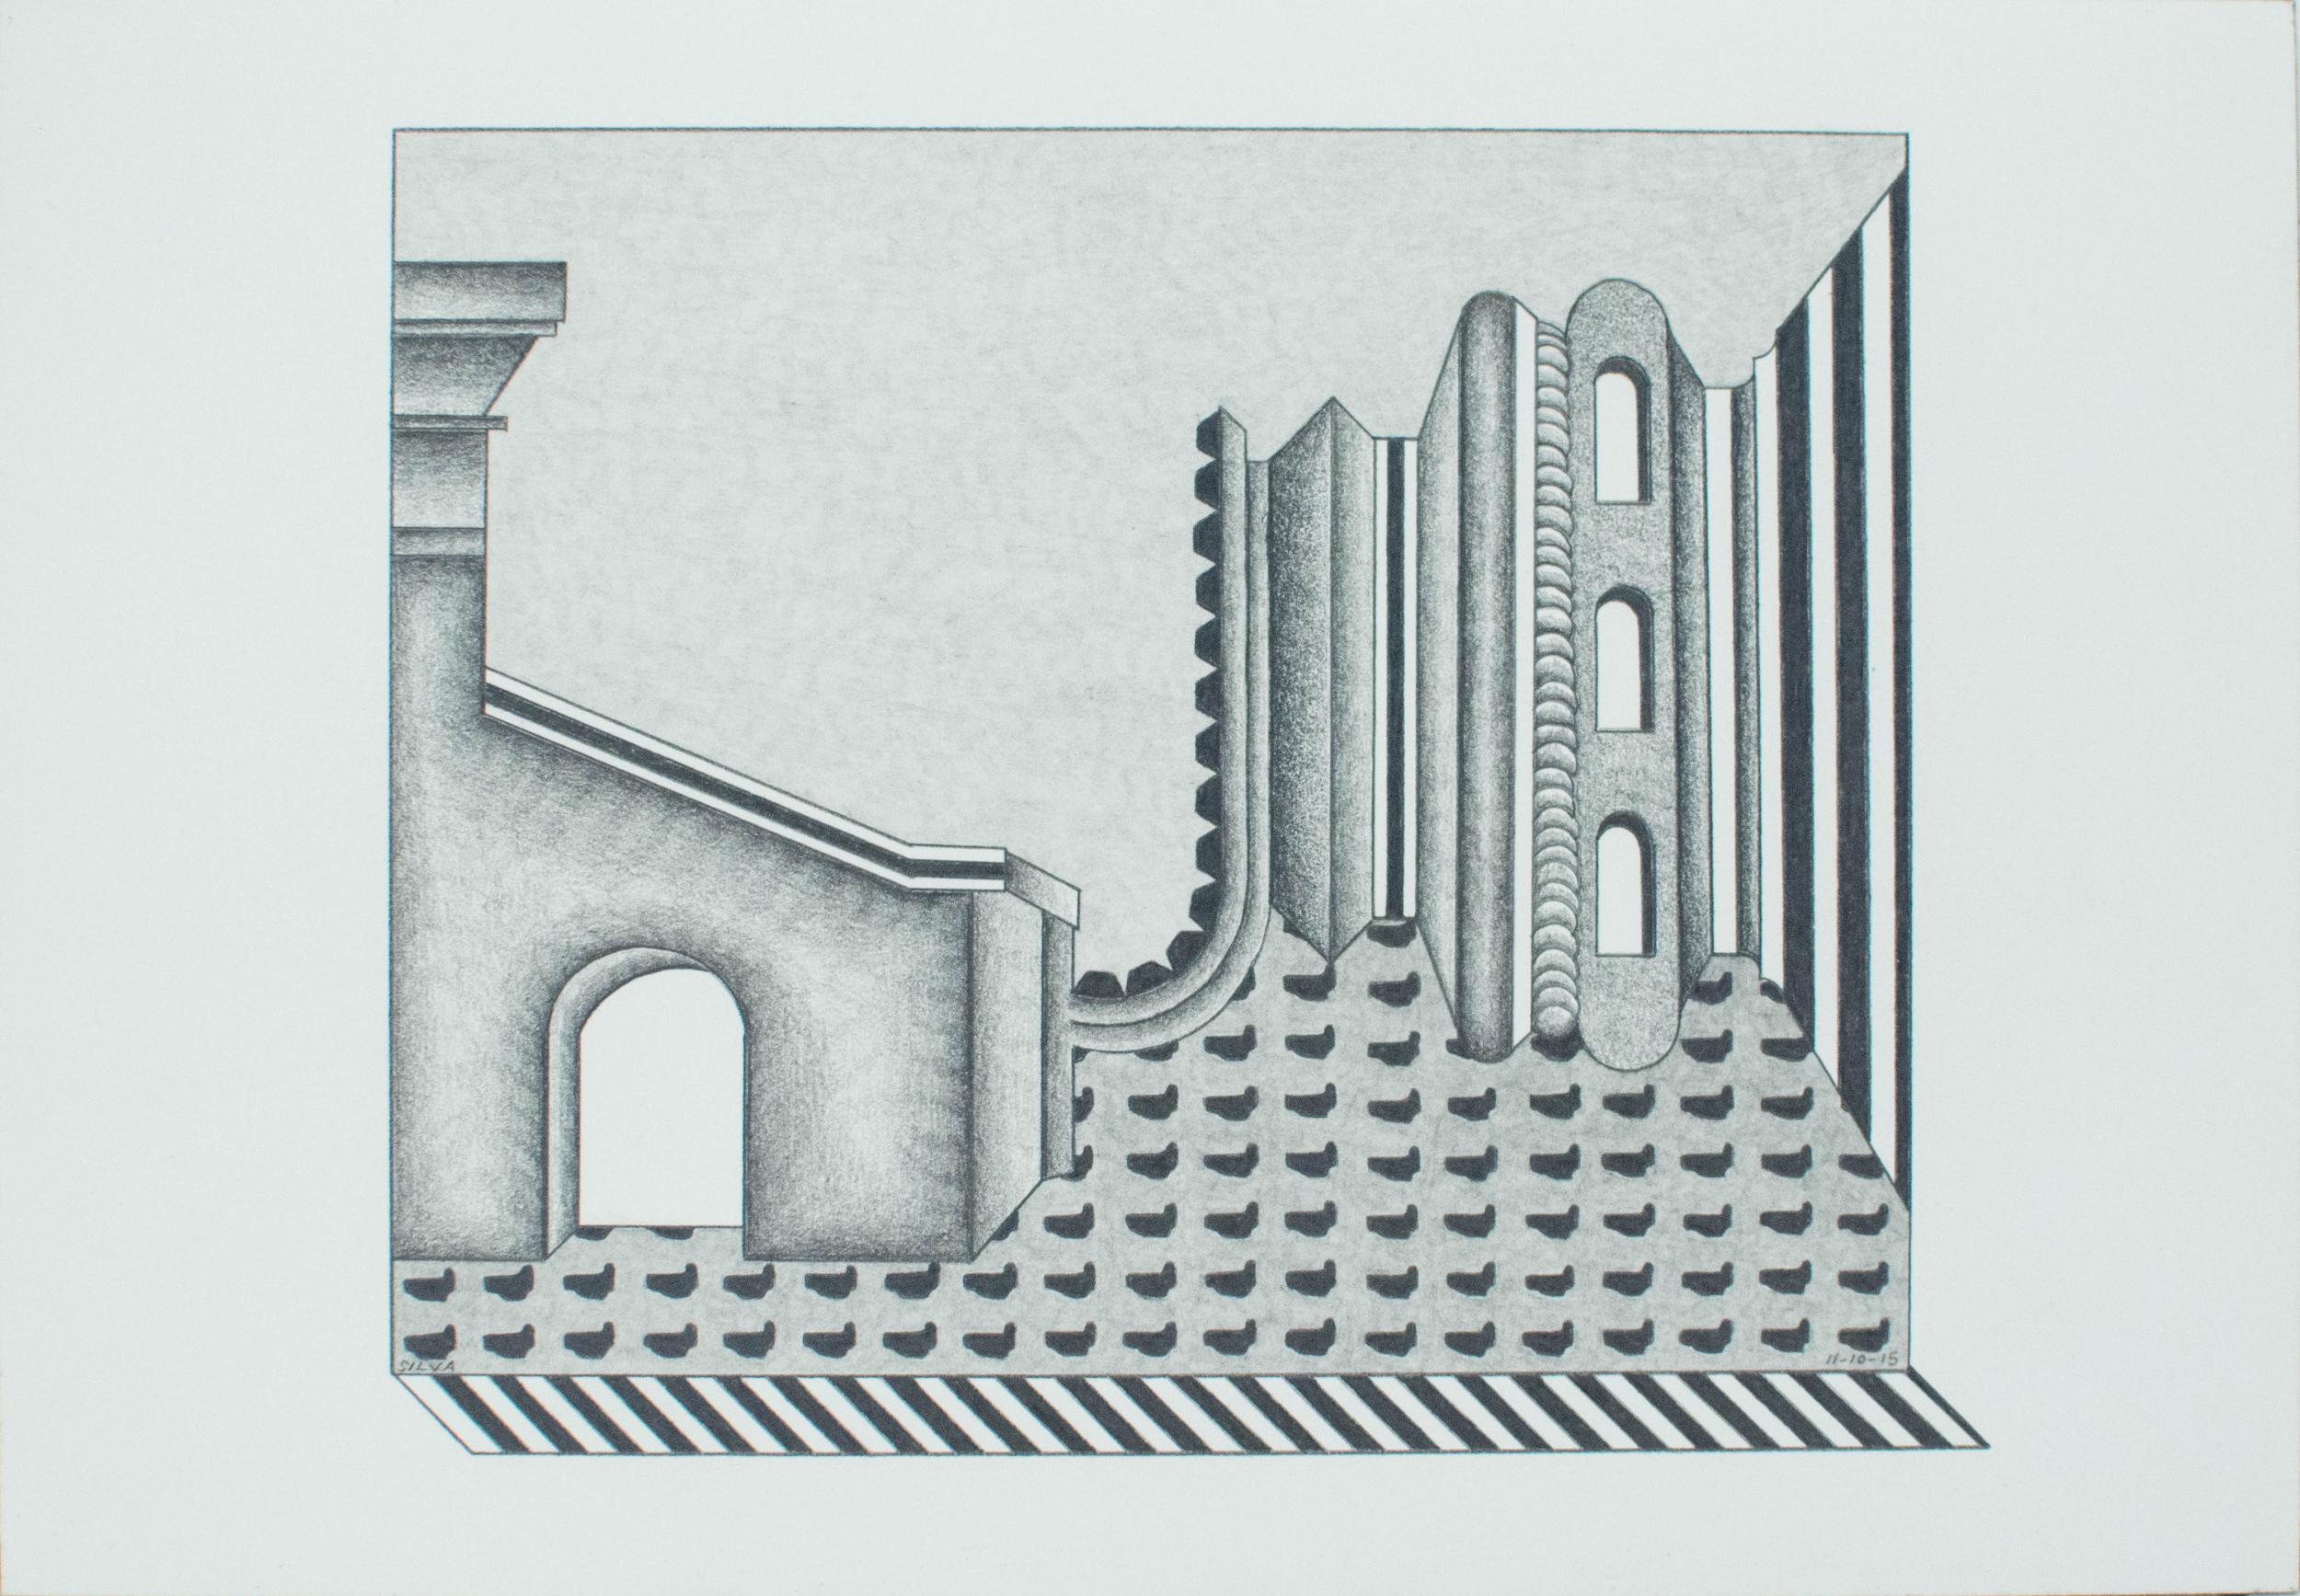 11-10-15, 2015, Graphite on paper, 7 x 10 inches